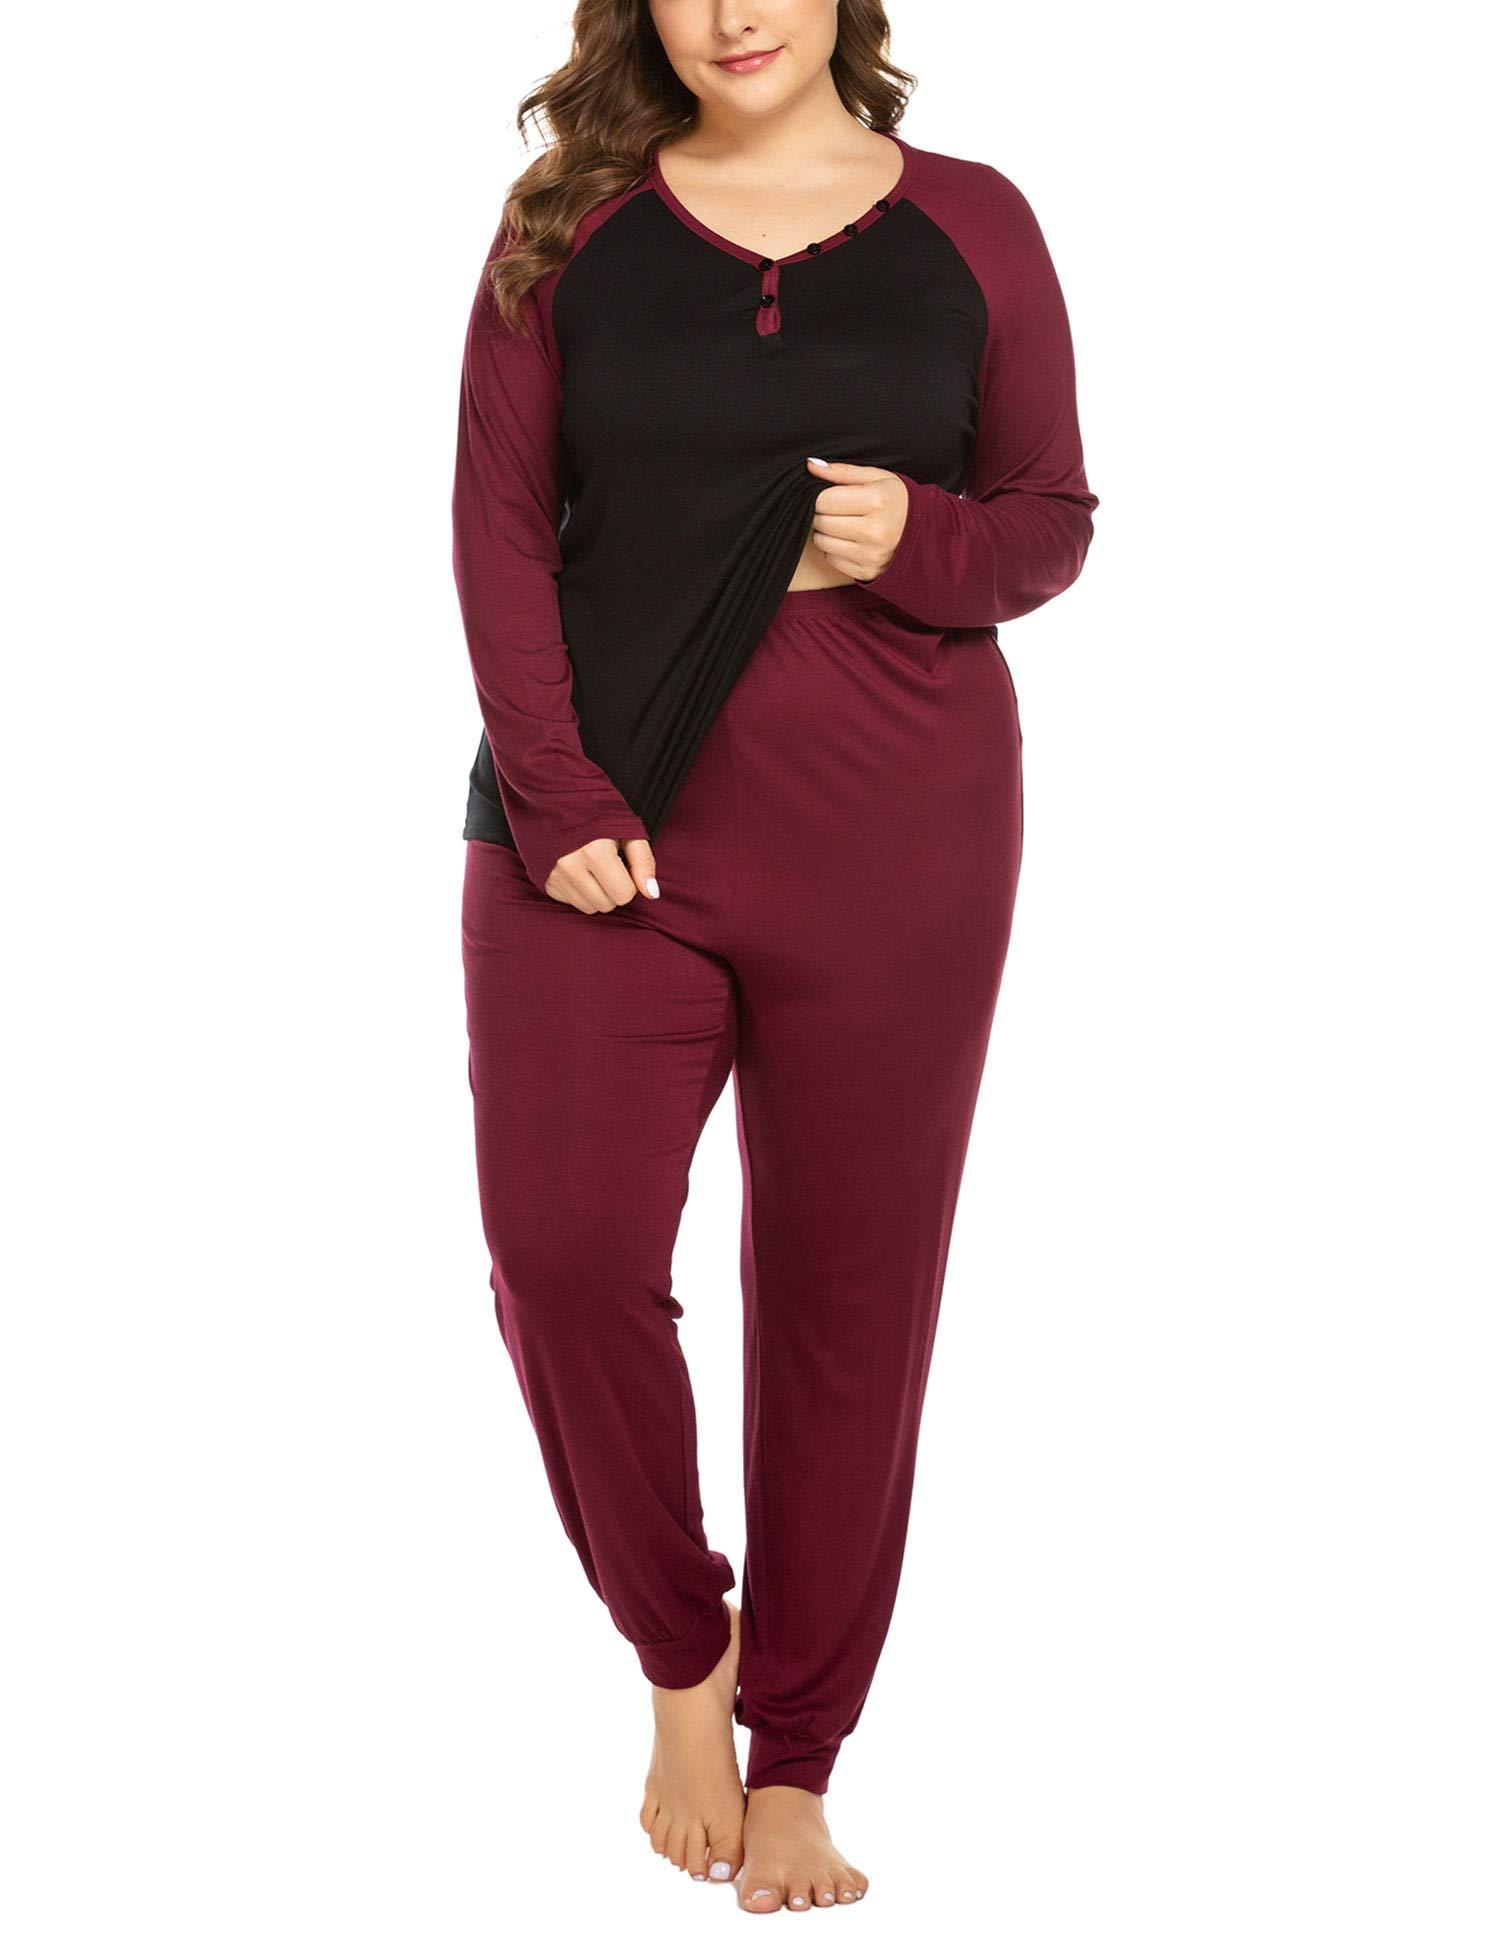 IN'VOLAND Womens Pajama Sets Plus Size Long Sleeve Sleepwear V Neck Button Pjs Soft Loungewear Set